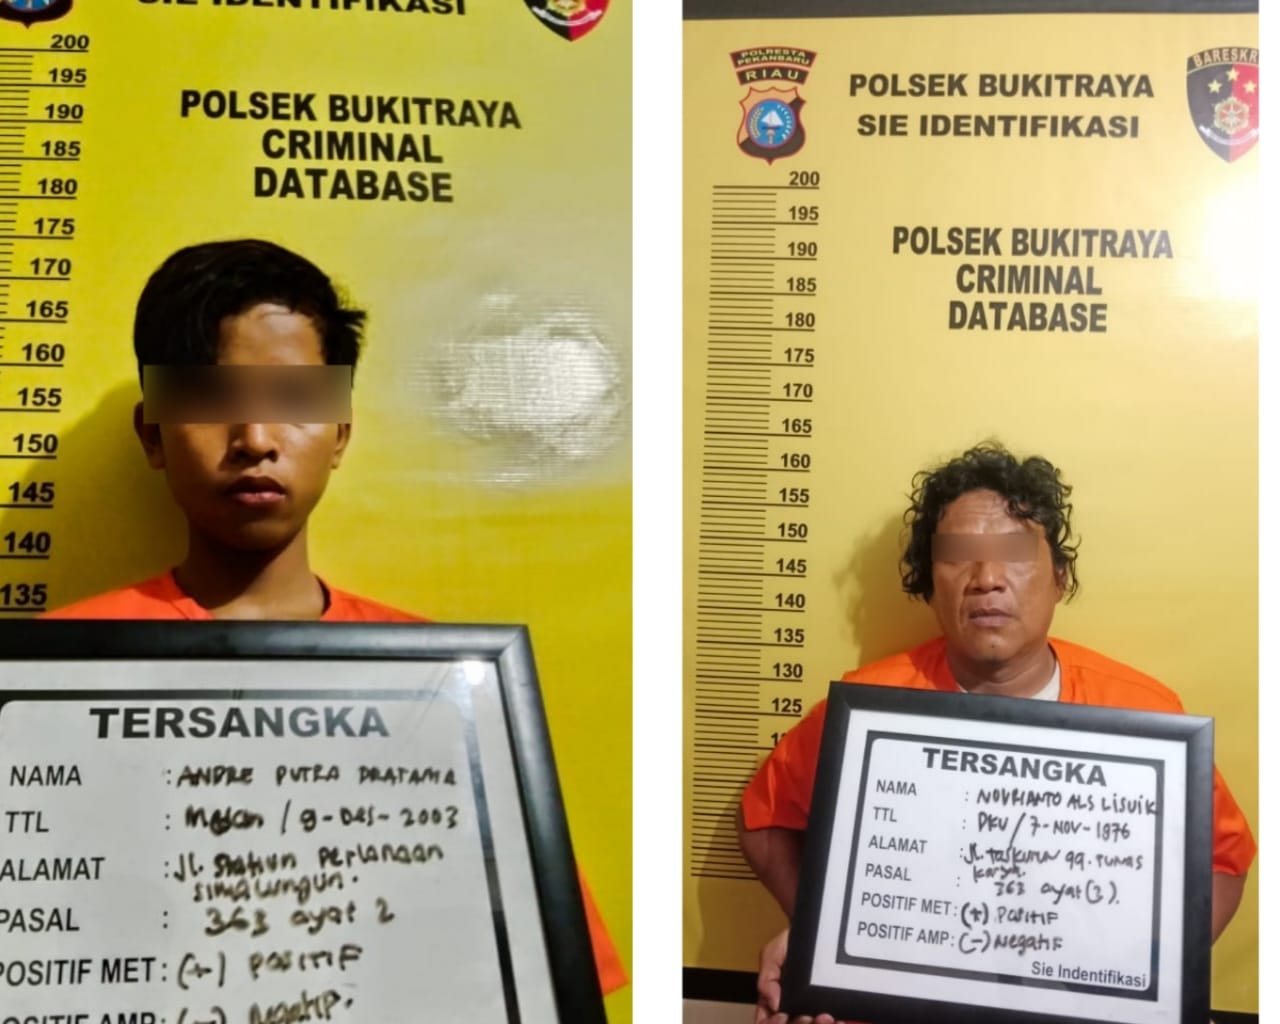 Dua Orang Yang Diduga Maling Berhasil Diringkus Polsek Bukit Raya